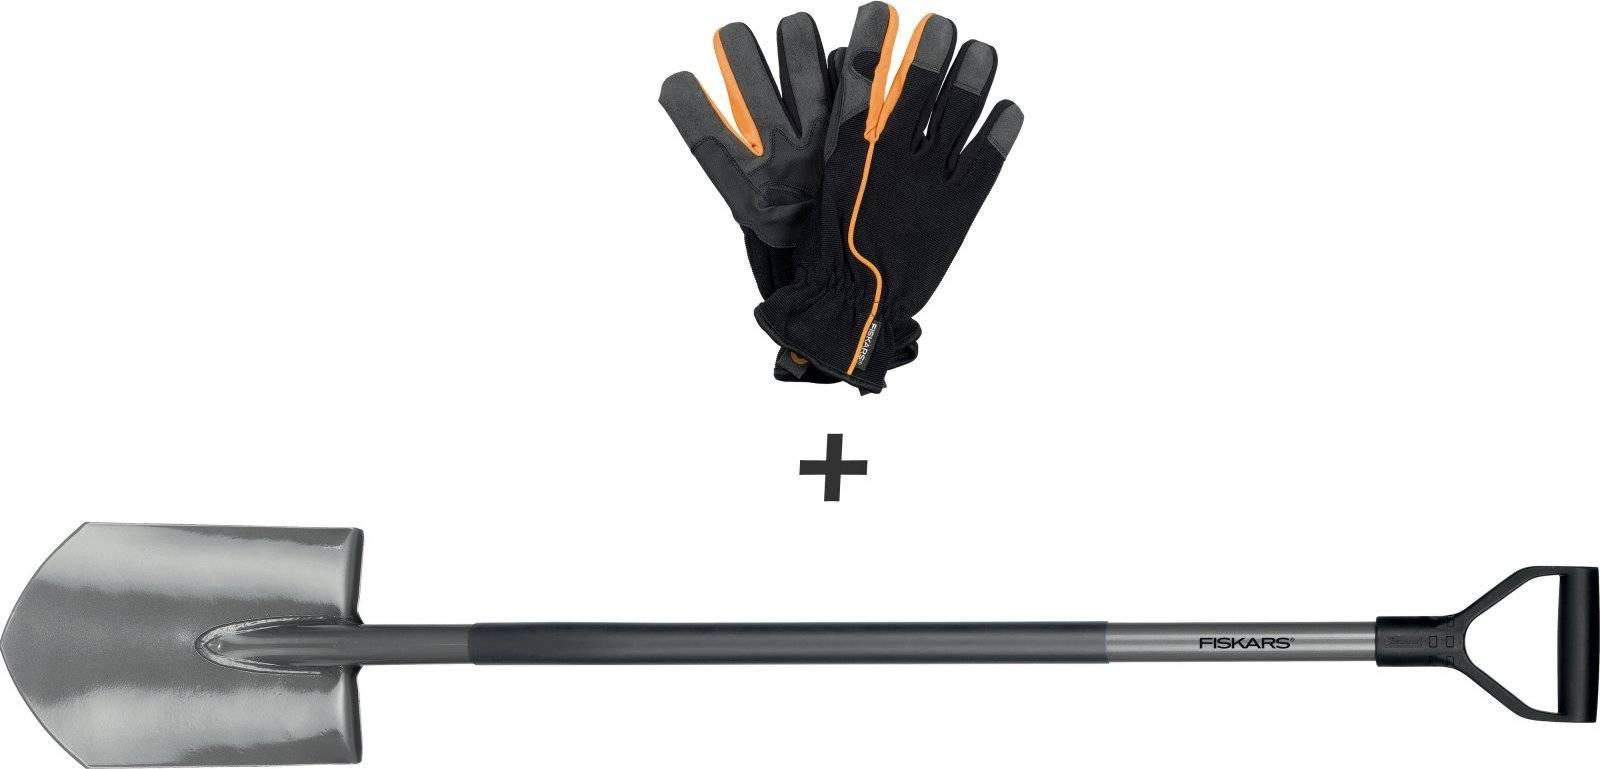 Sada rýč špičatý + pracovní rukavice 1014769 Fiskars